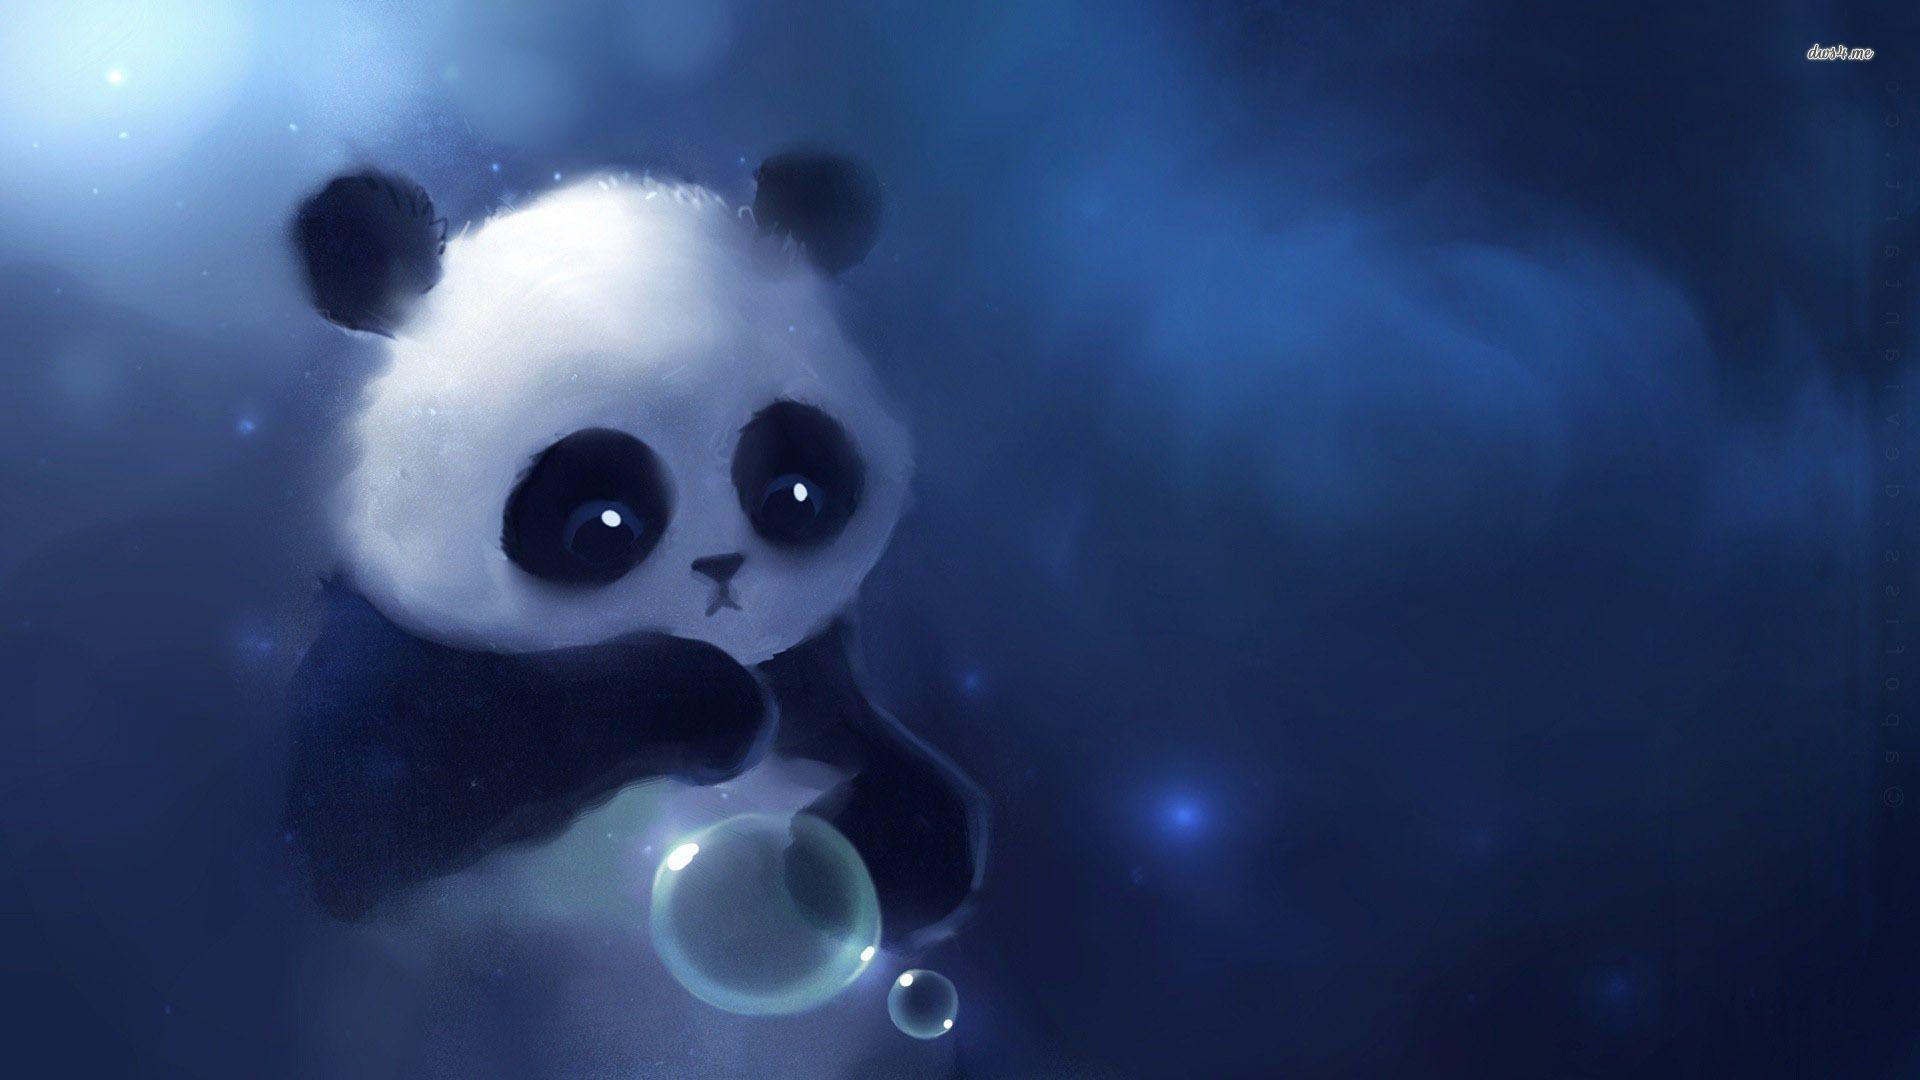 Baby Panda Wallpapers 1920x1080